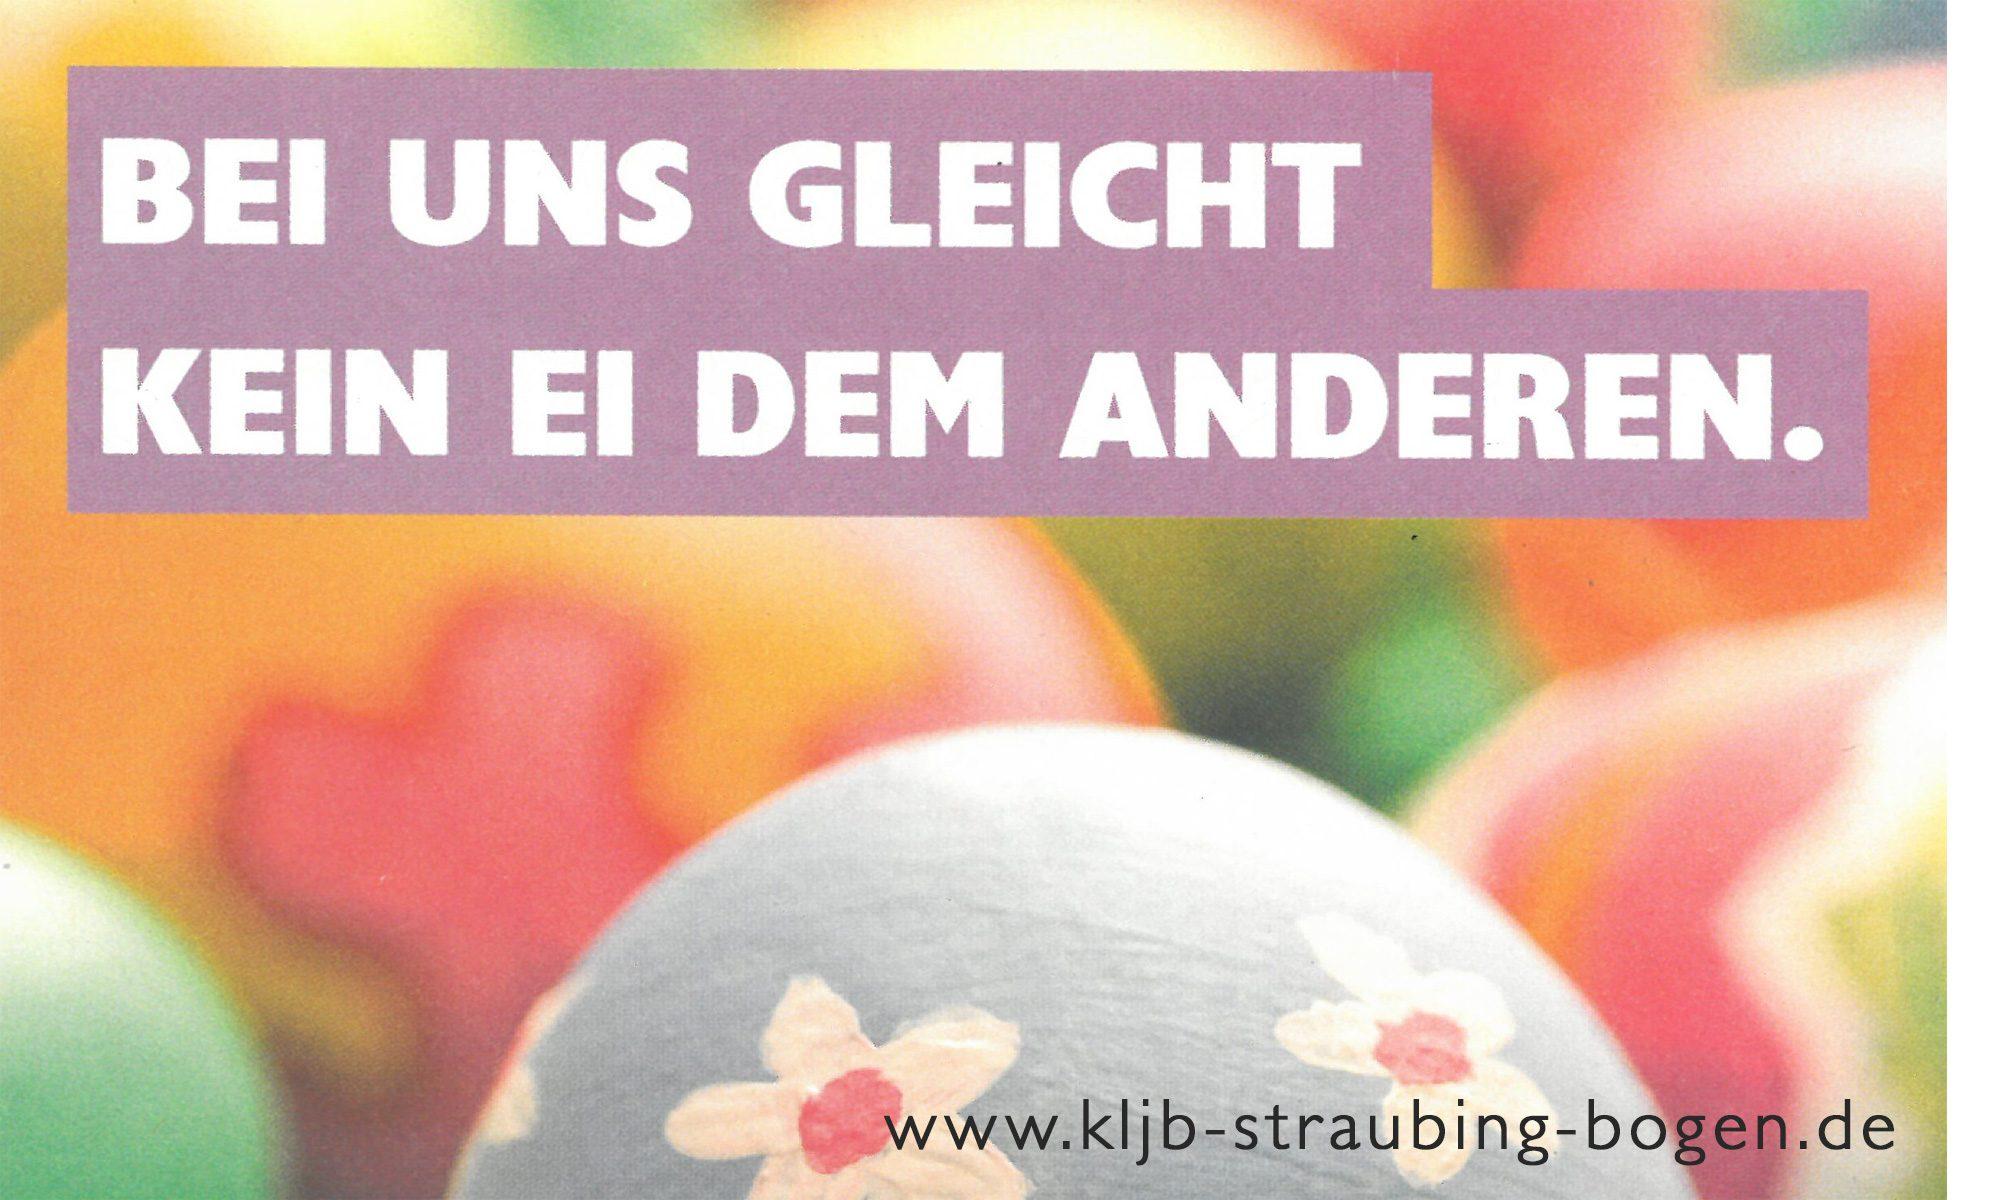 KLJB Straubing-Bogen